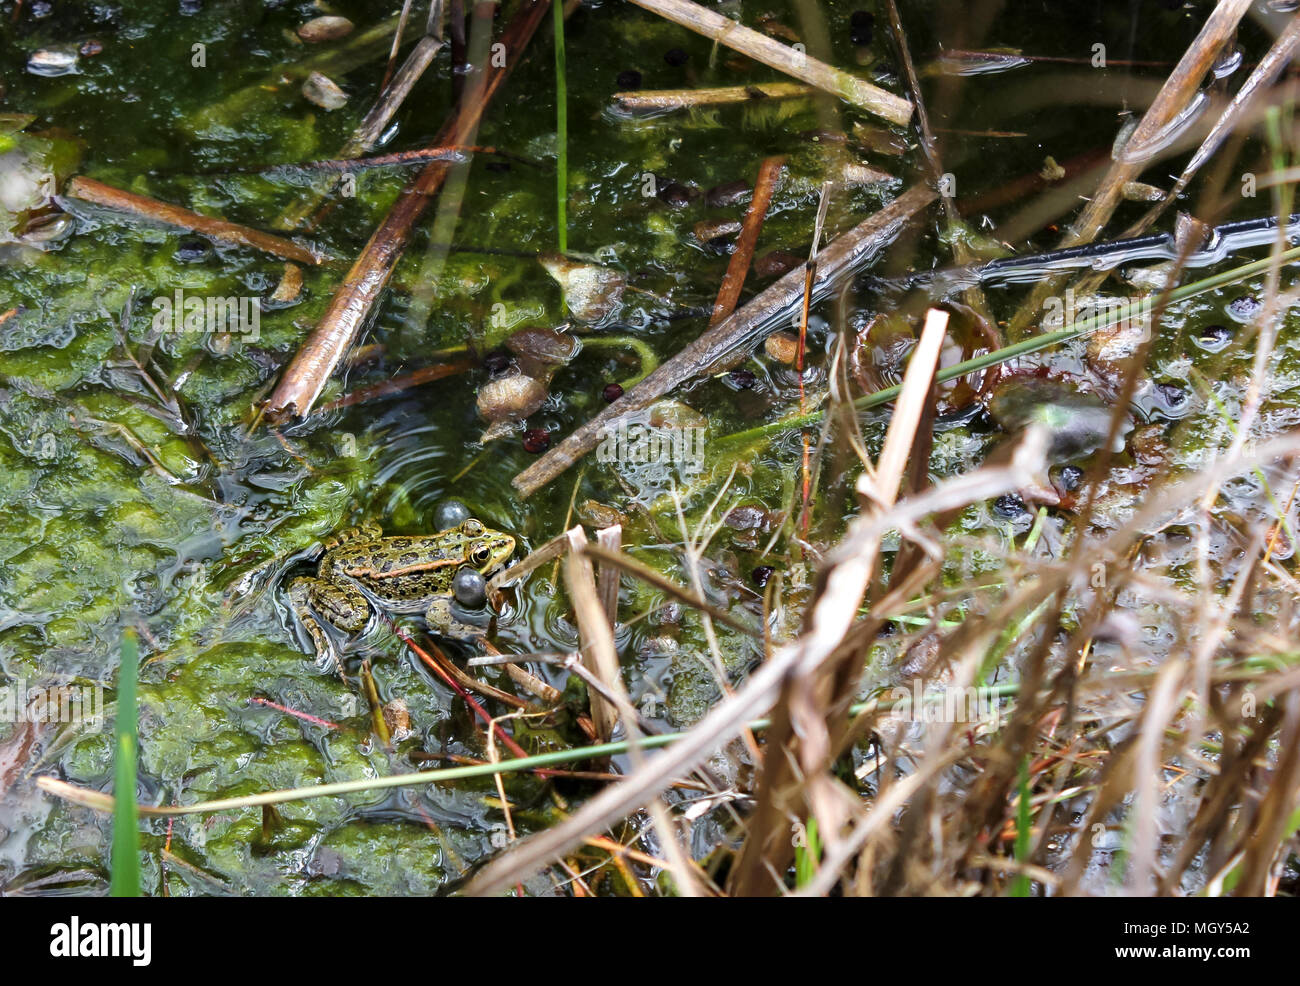 frog croaking in a pond. Madrid botanical garden - Stock Image